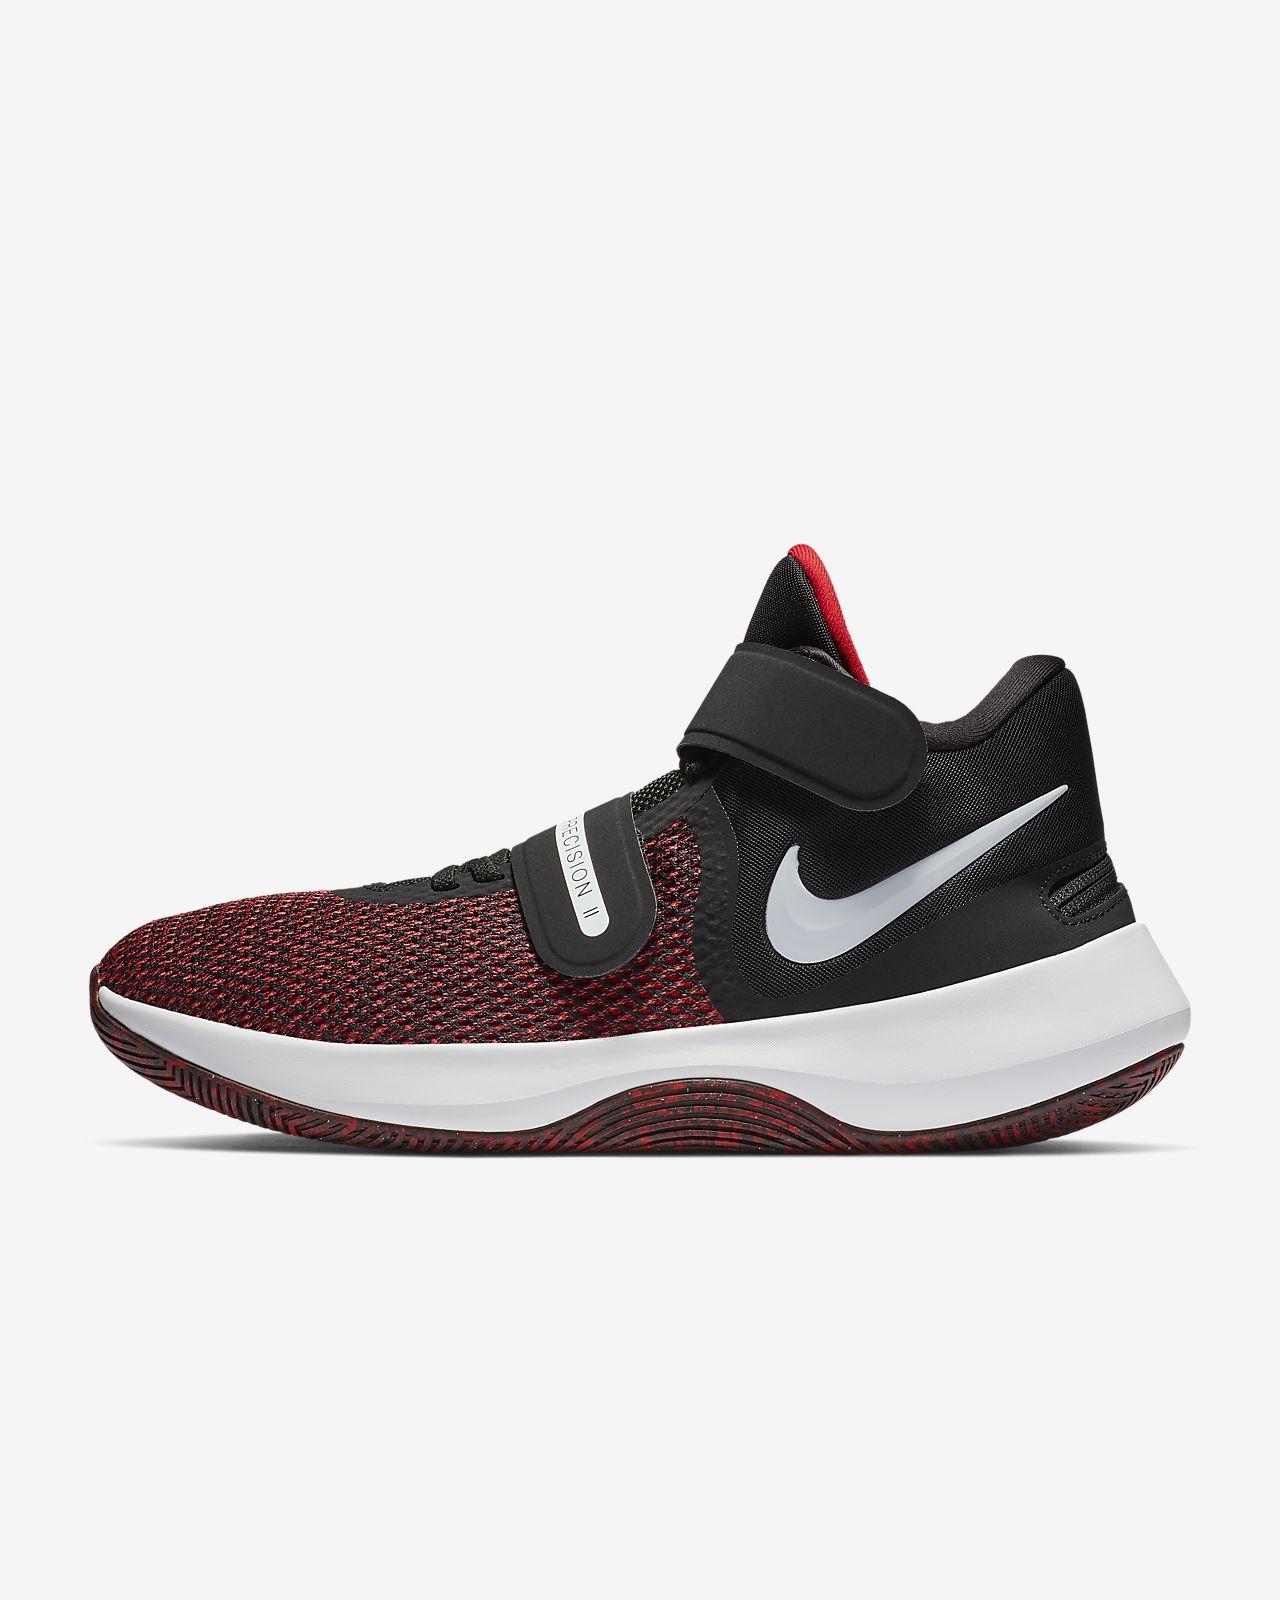 6a3485d26982b Nike Air Precision 2 FlyEase Men s Basketball Shoe. Nike.com